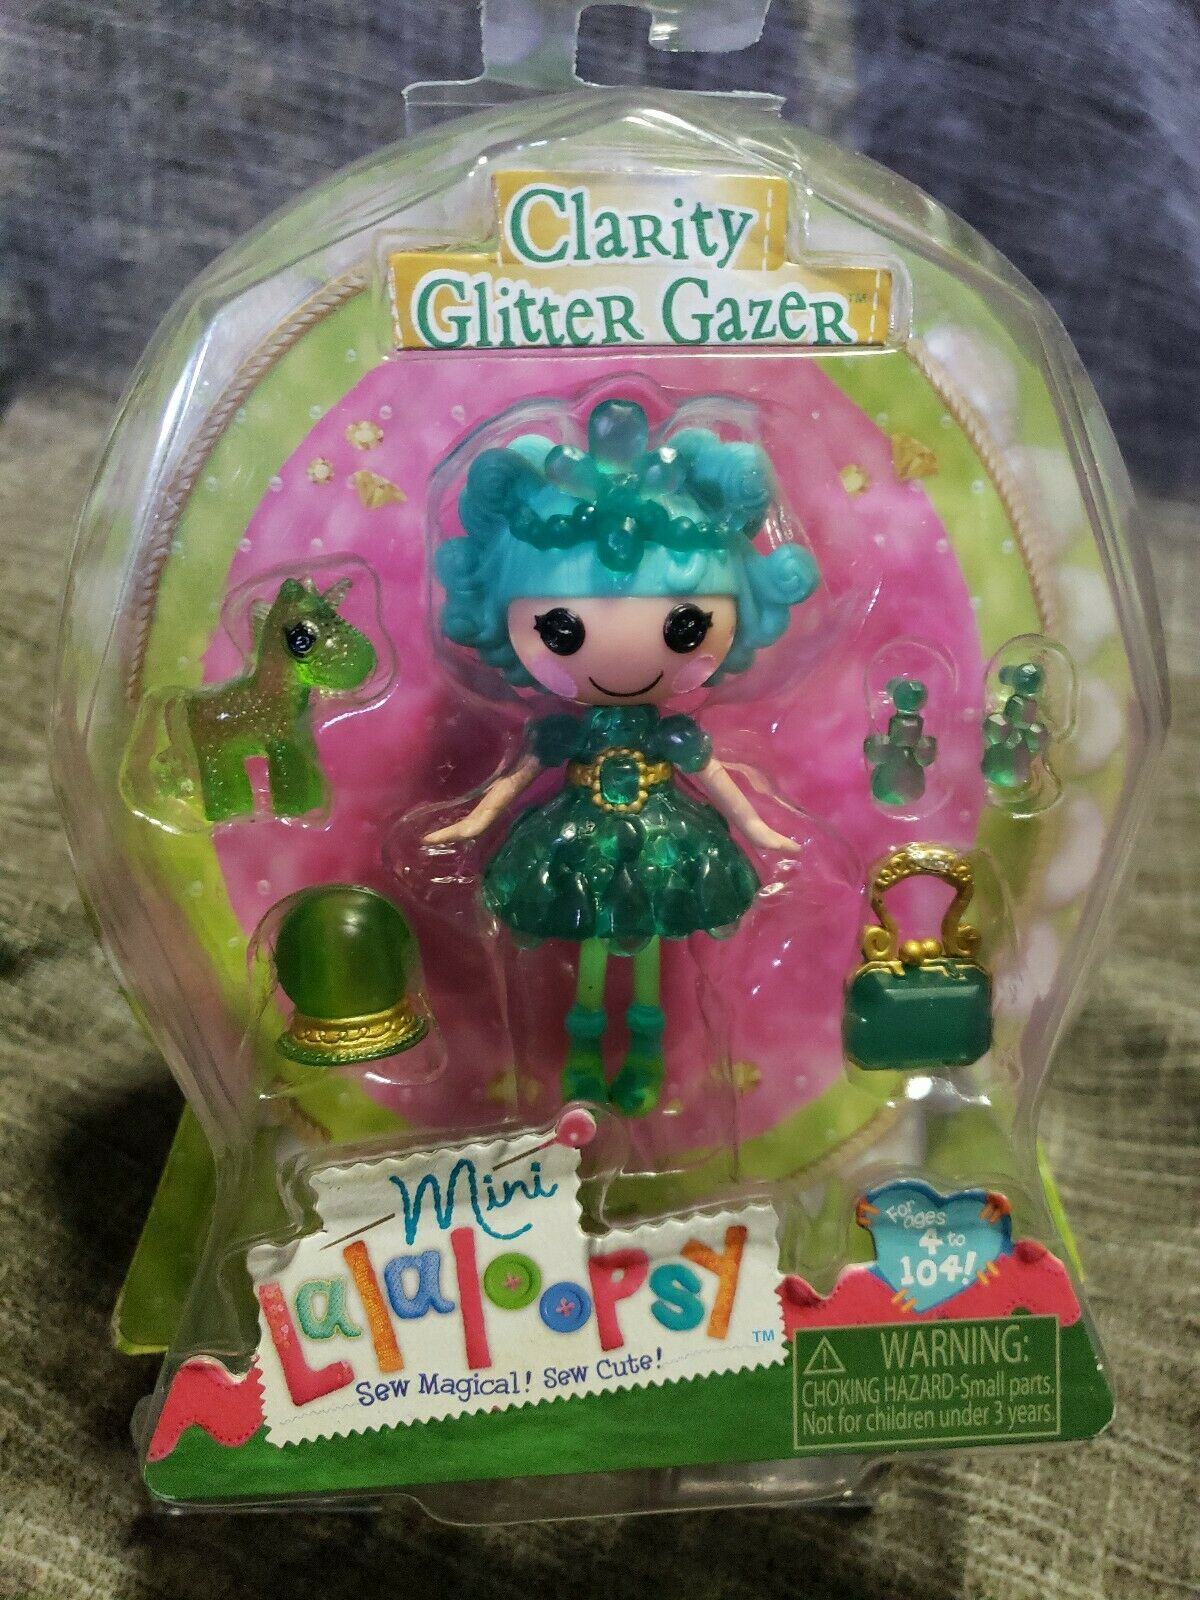 Lalaloopsy Mini, Clarity Glitter Gazer, 4  Doll, She Sees the Future - New, NWB